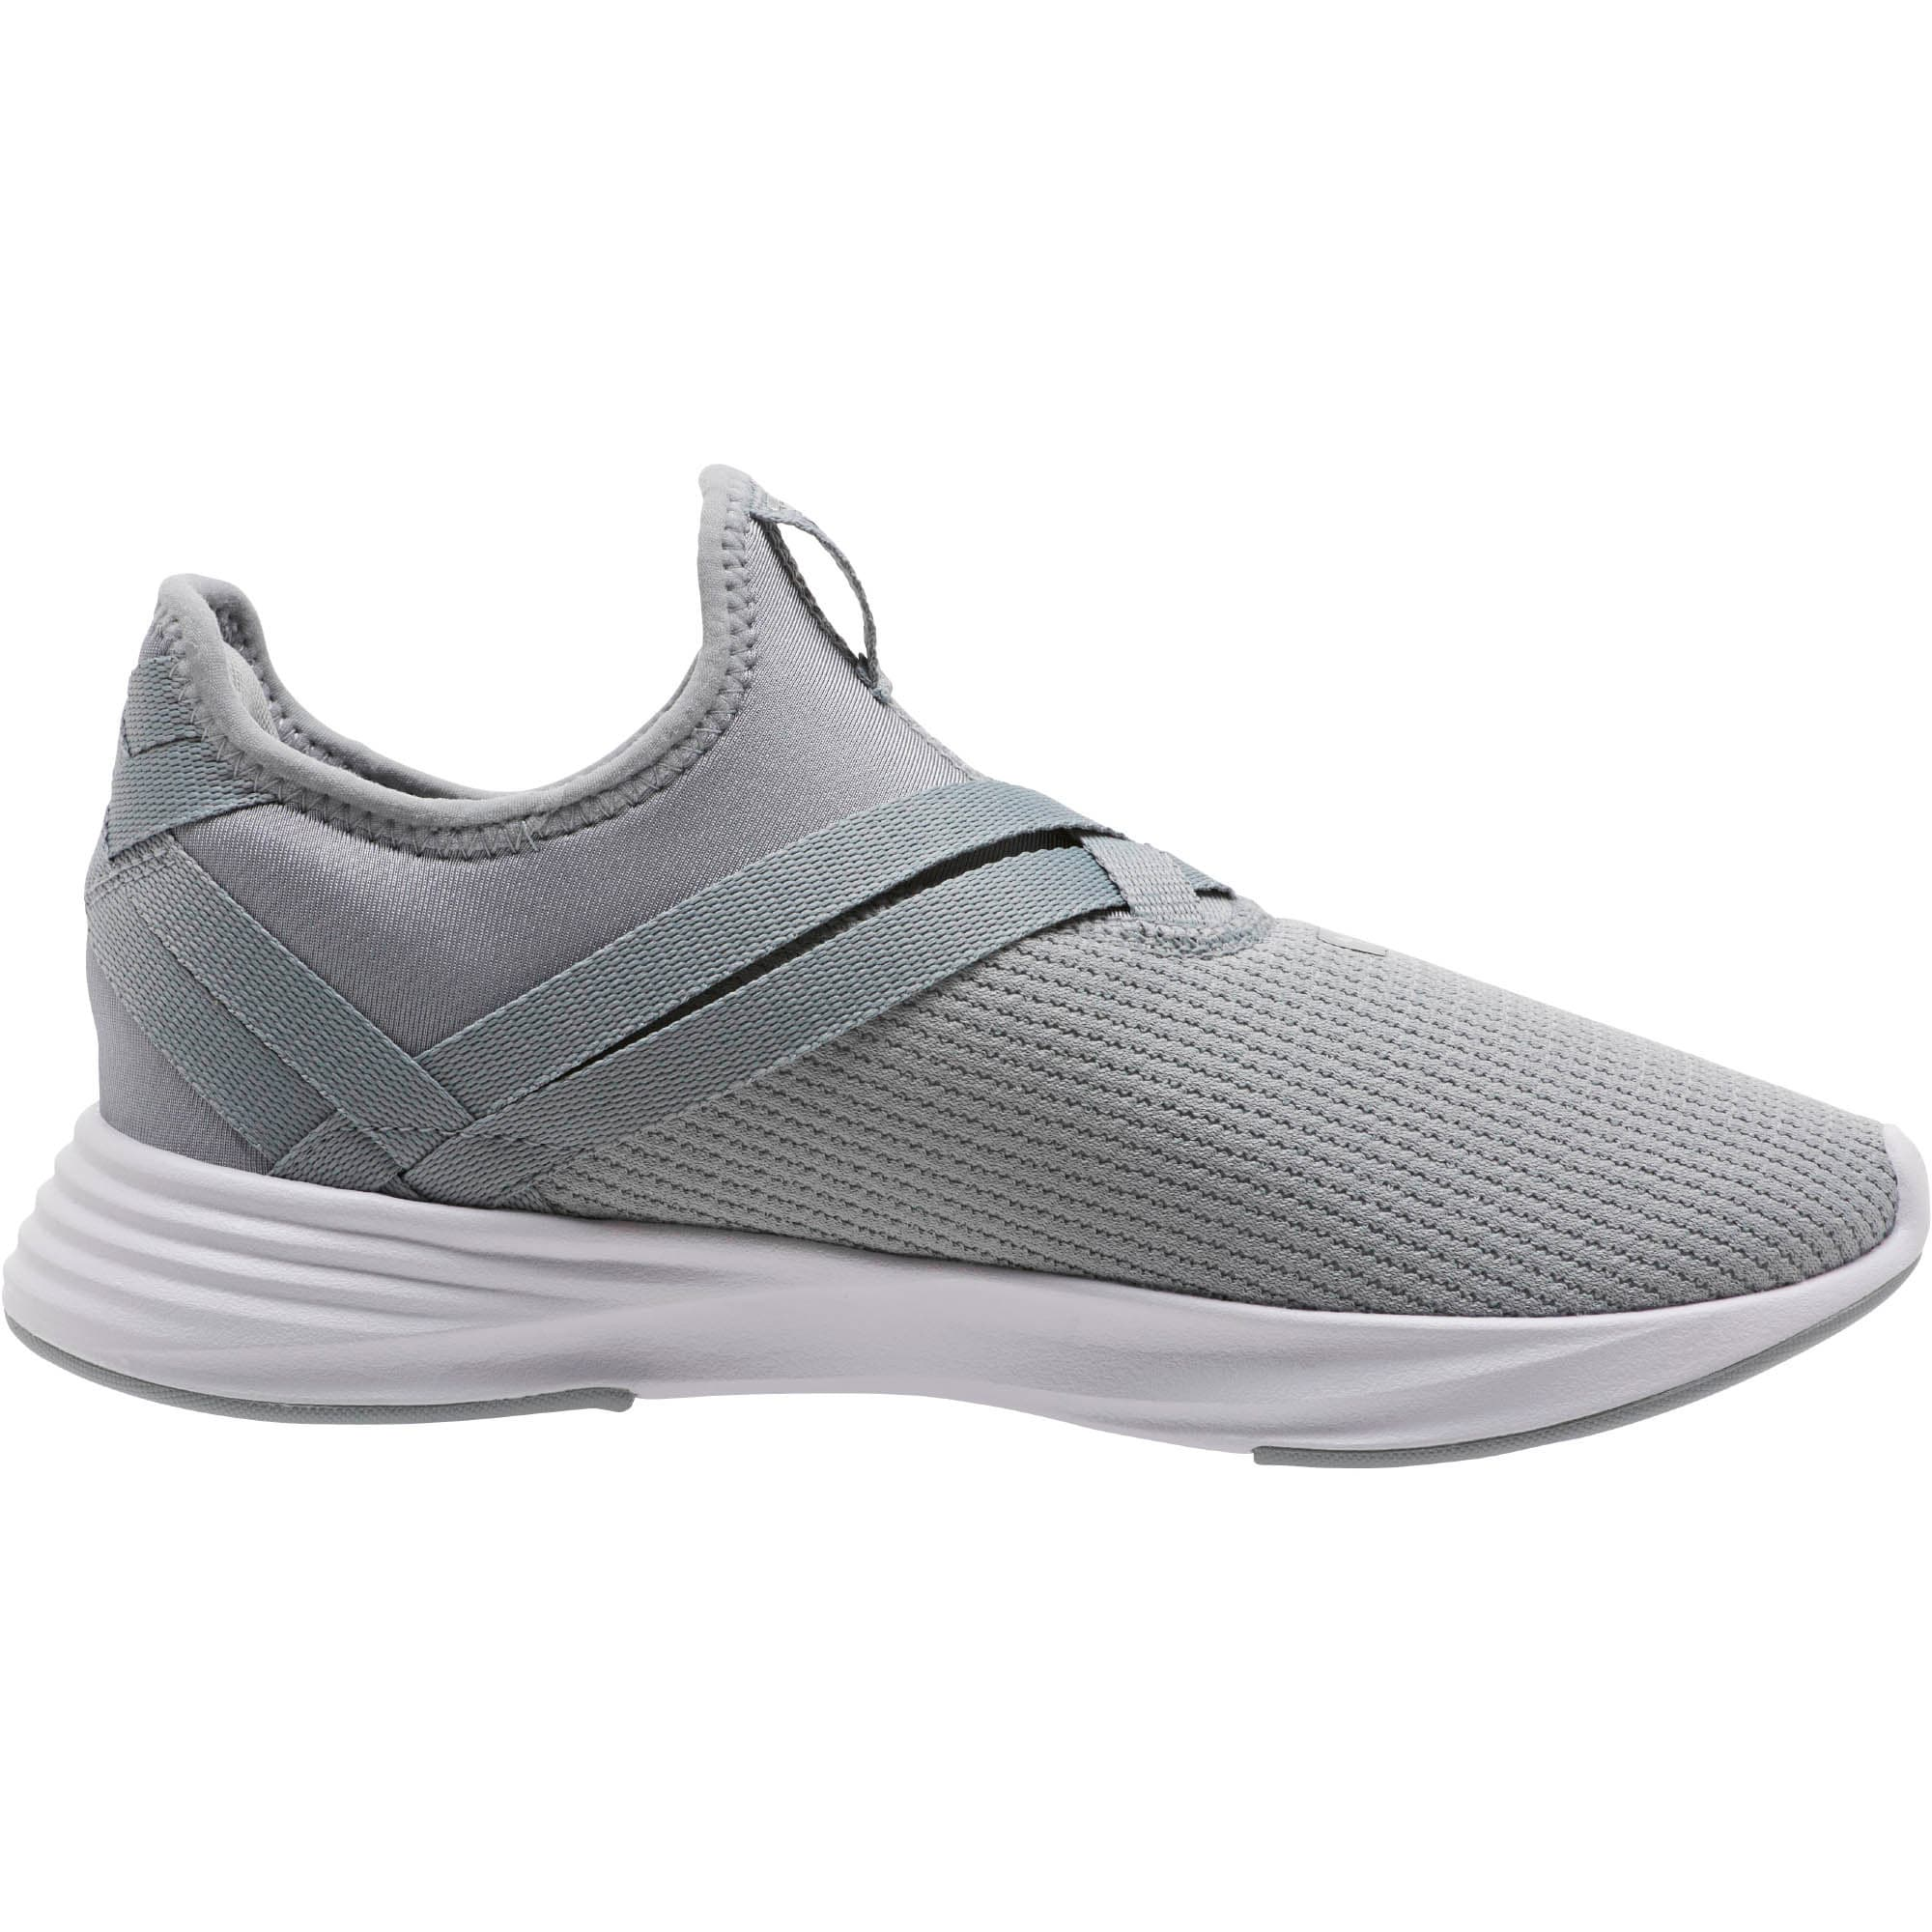 Thumbnail 3 of Radiate XT Slip-On Women's Sneakers, Quarry-Puma Silver, medium